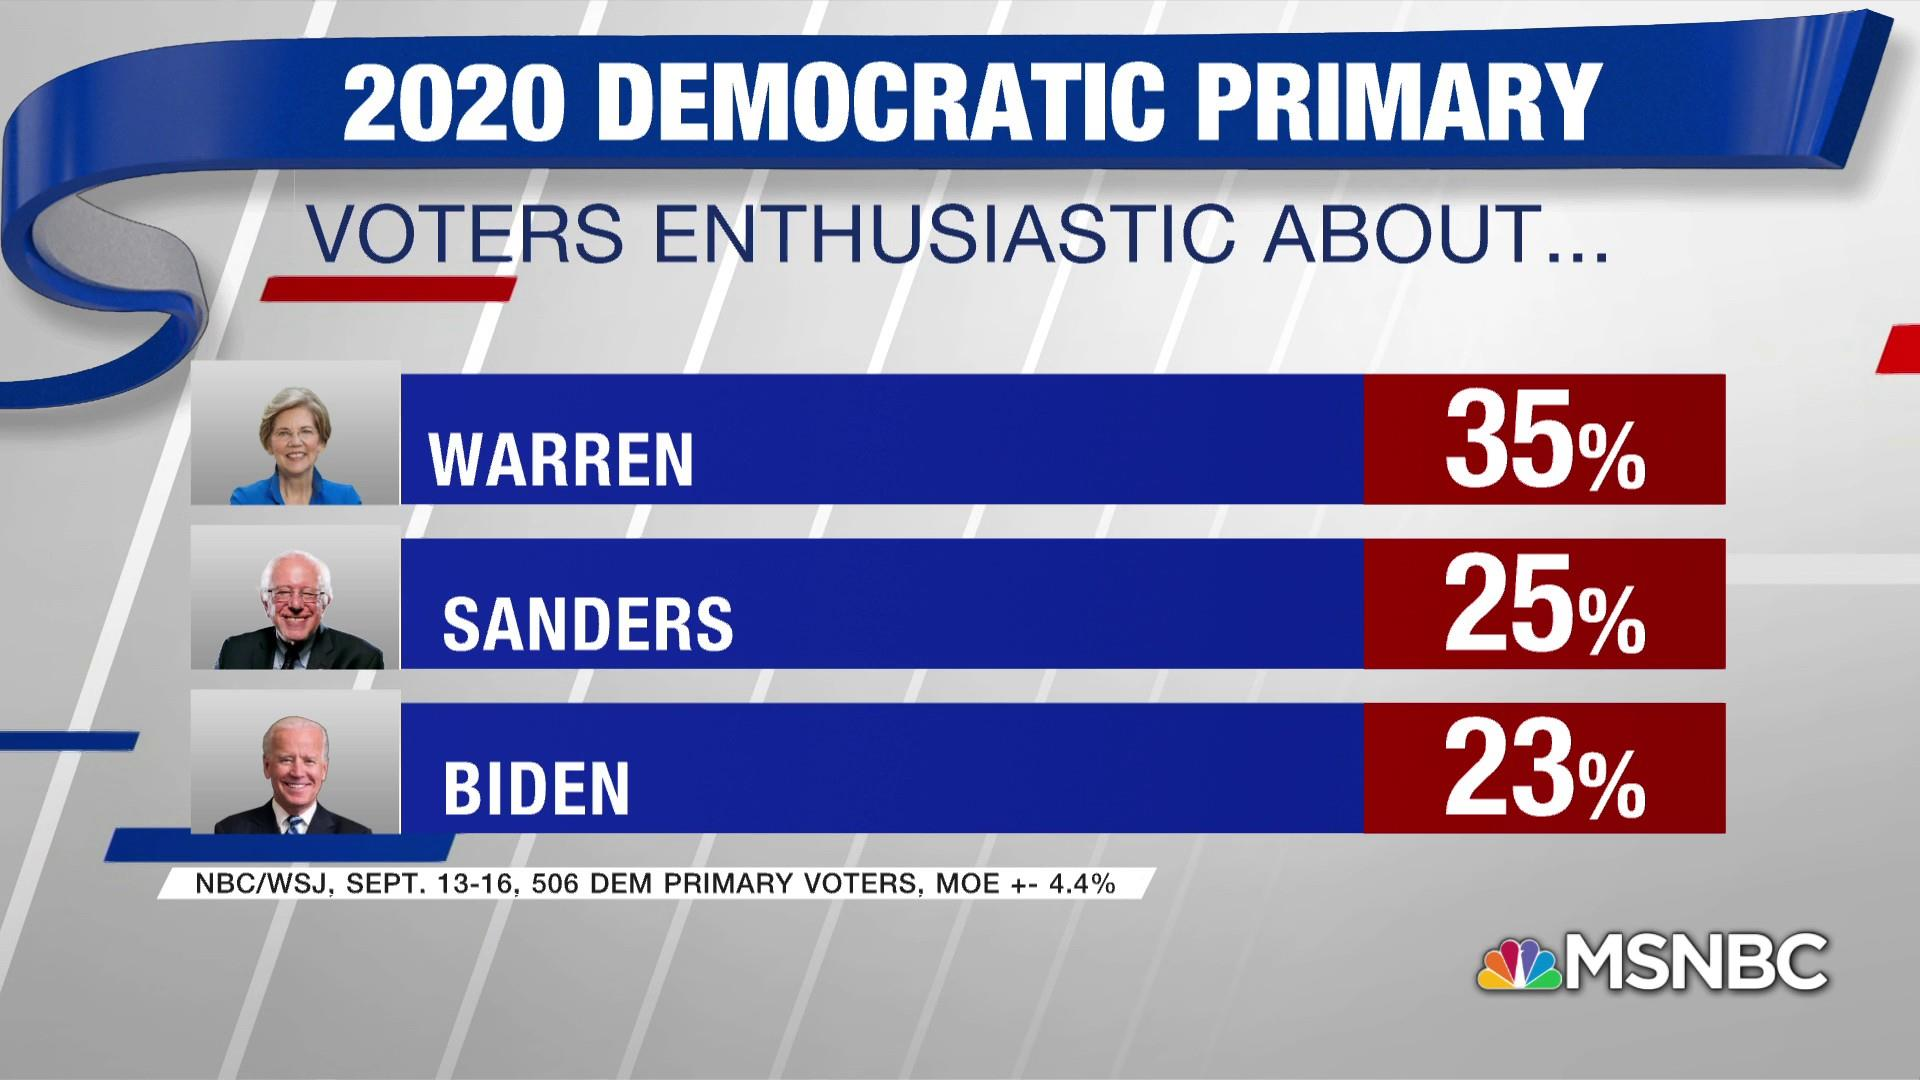 NBC News/WSJ Poll: Elizabeth Warren leads in enthusiasm